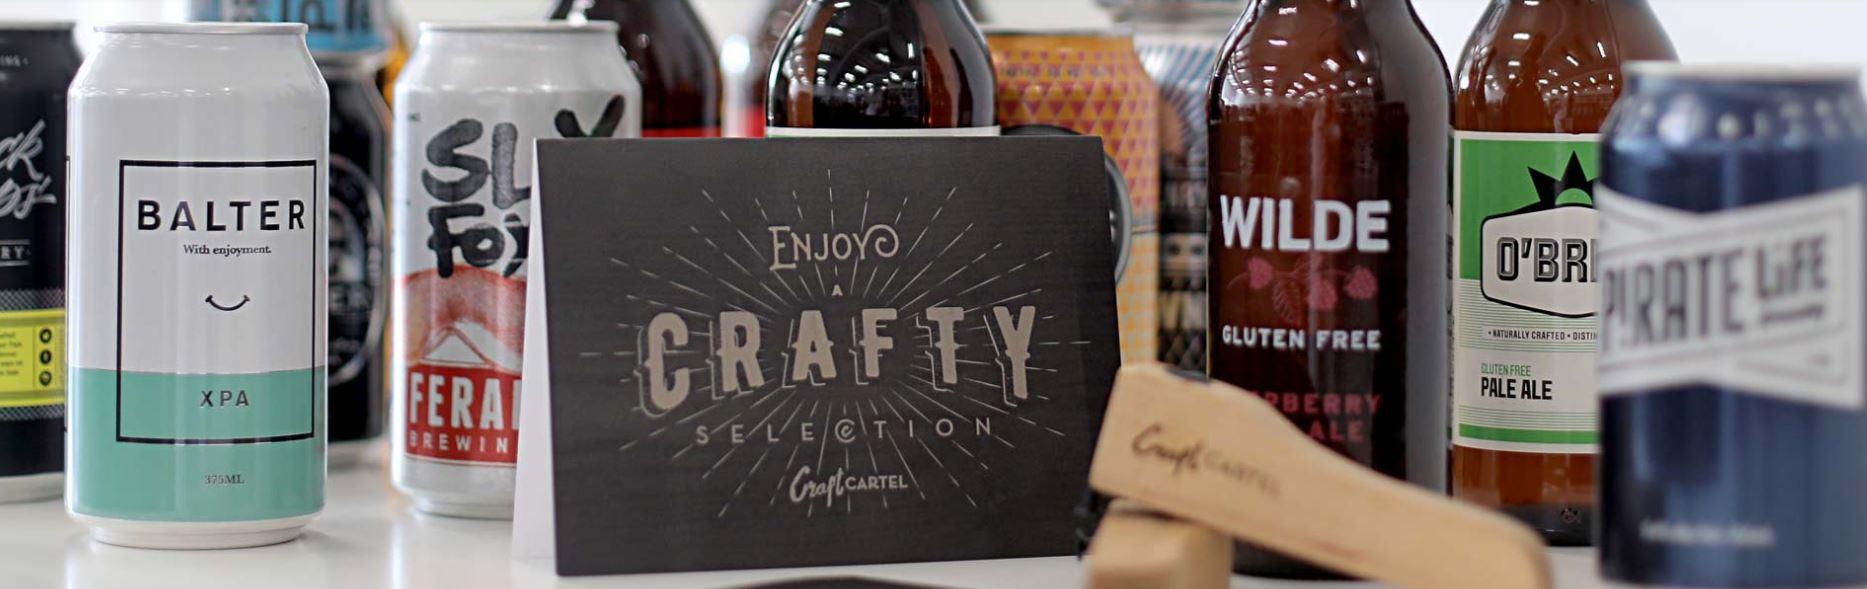 Craft Cartel Liquor Latest Promotions